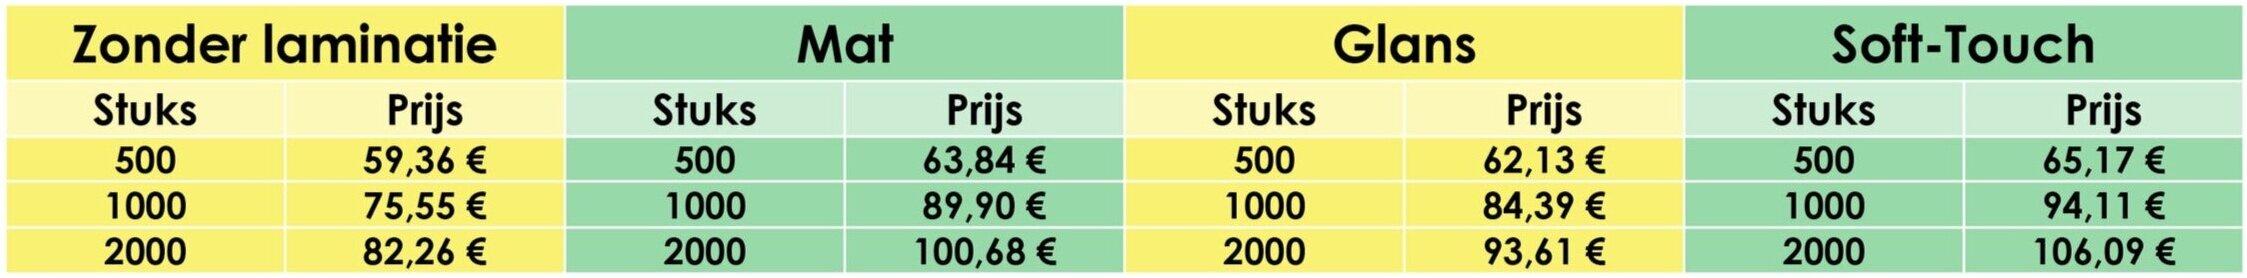 Prijzen%2BWebhop_Naamkaartjes_27%2B09%2B2019.jpg